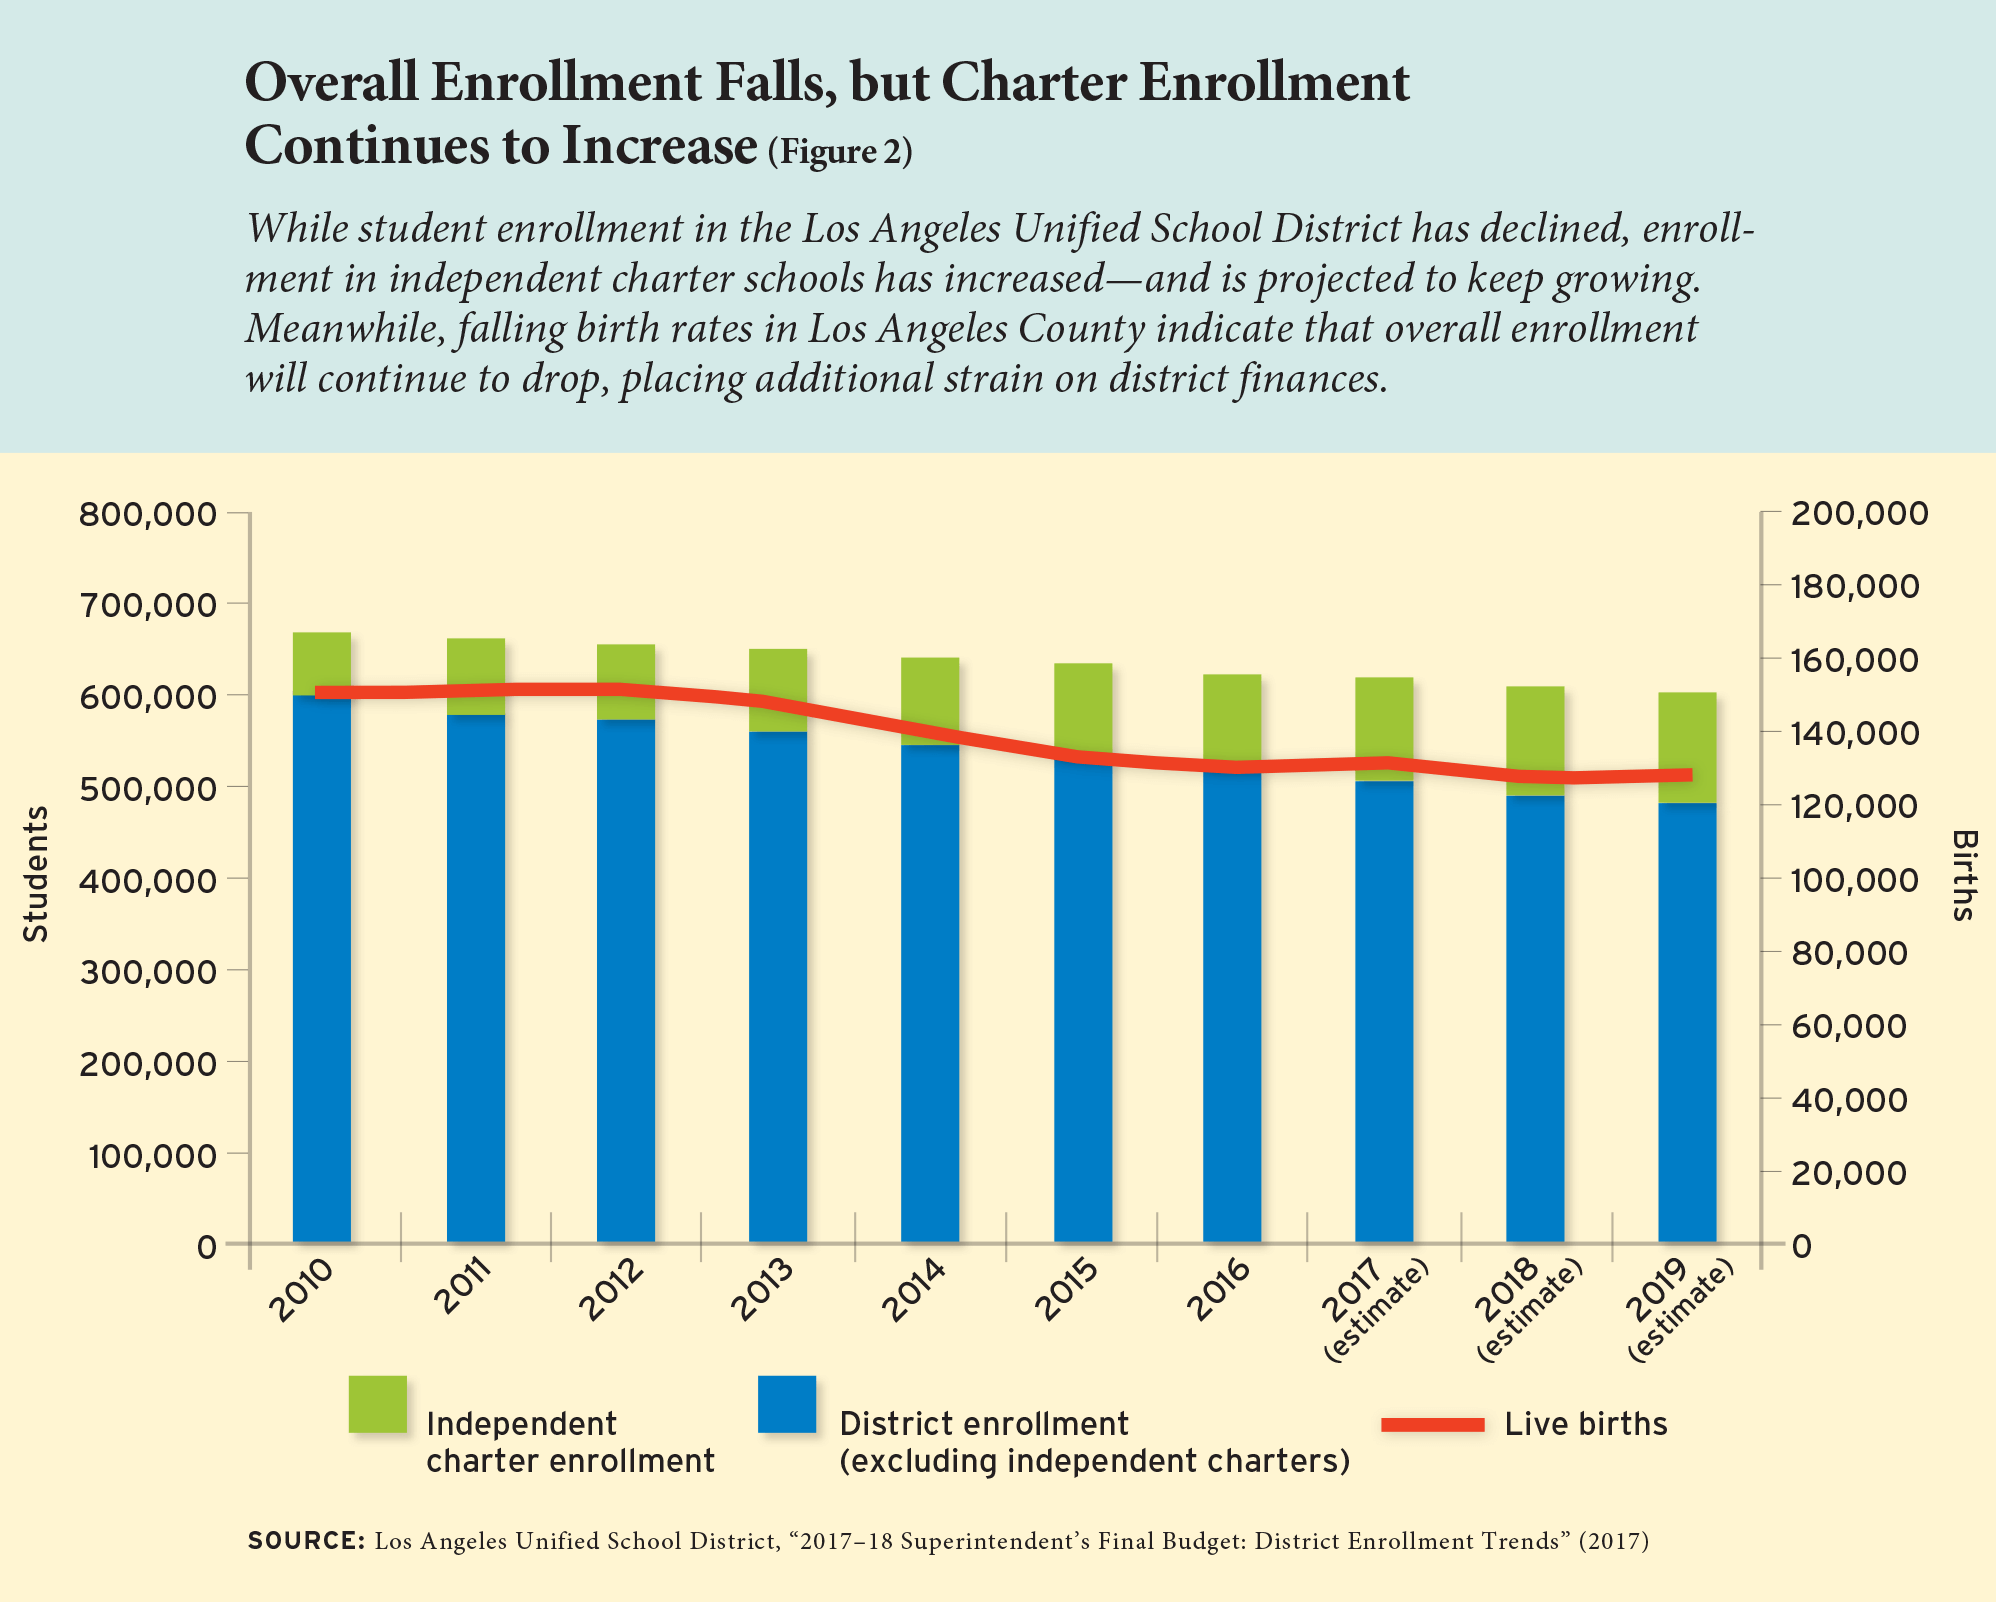 Overall Enrollment Falls, but Charter Enrollment Continues to Increase (Figure 2)